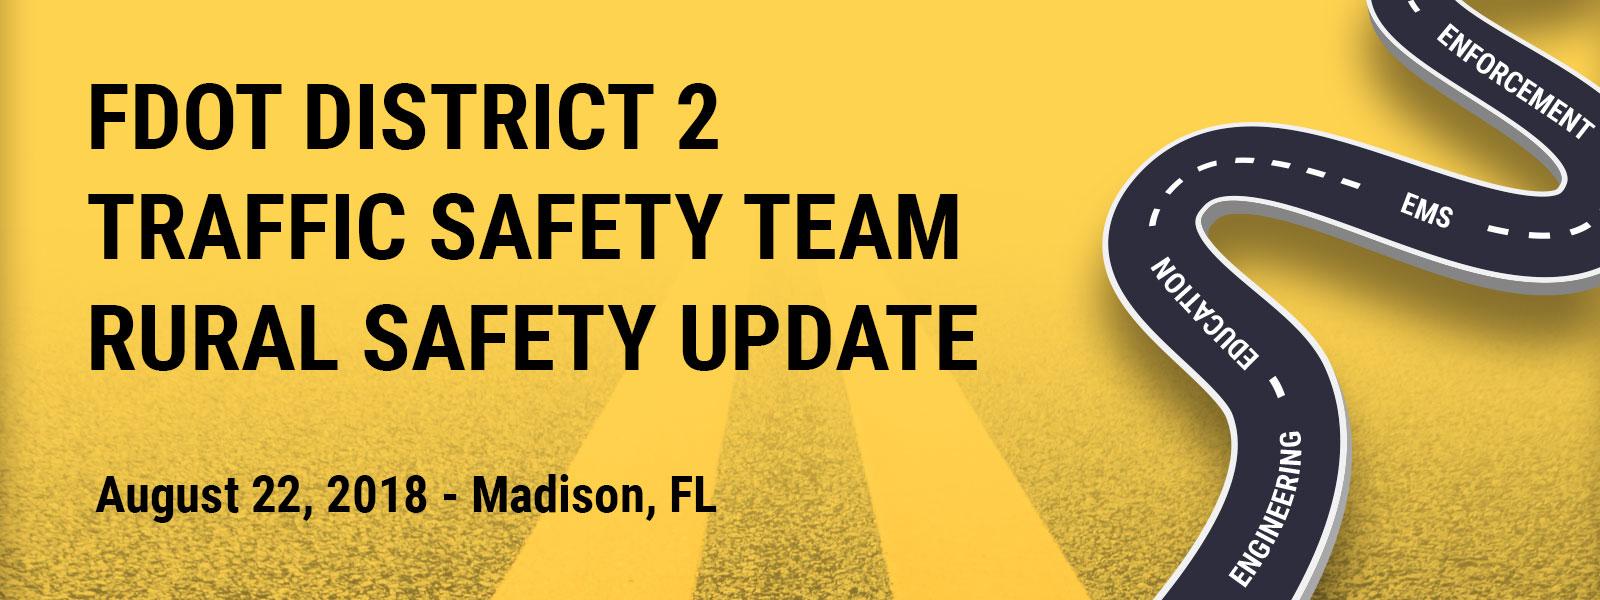 FDOT District 2 Traffic Safety Team Rural Safety Update